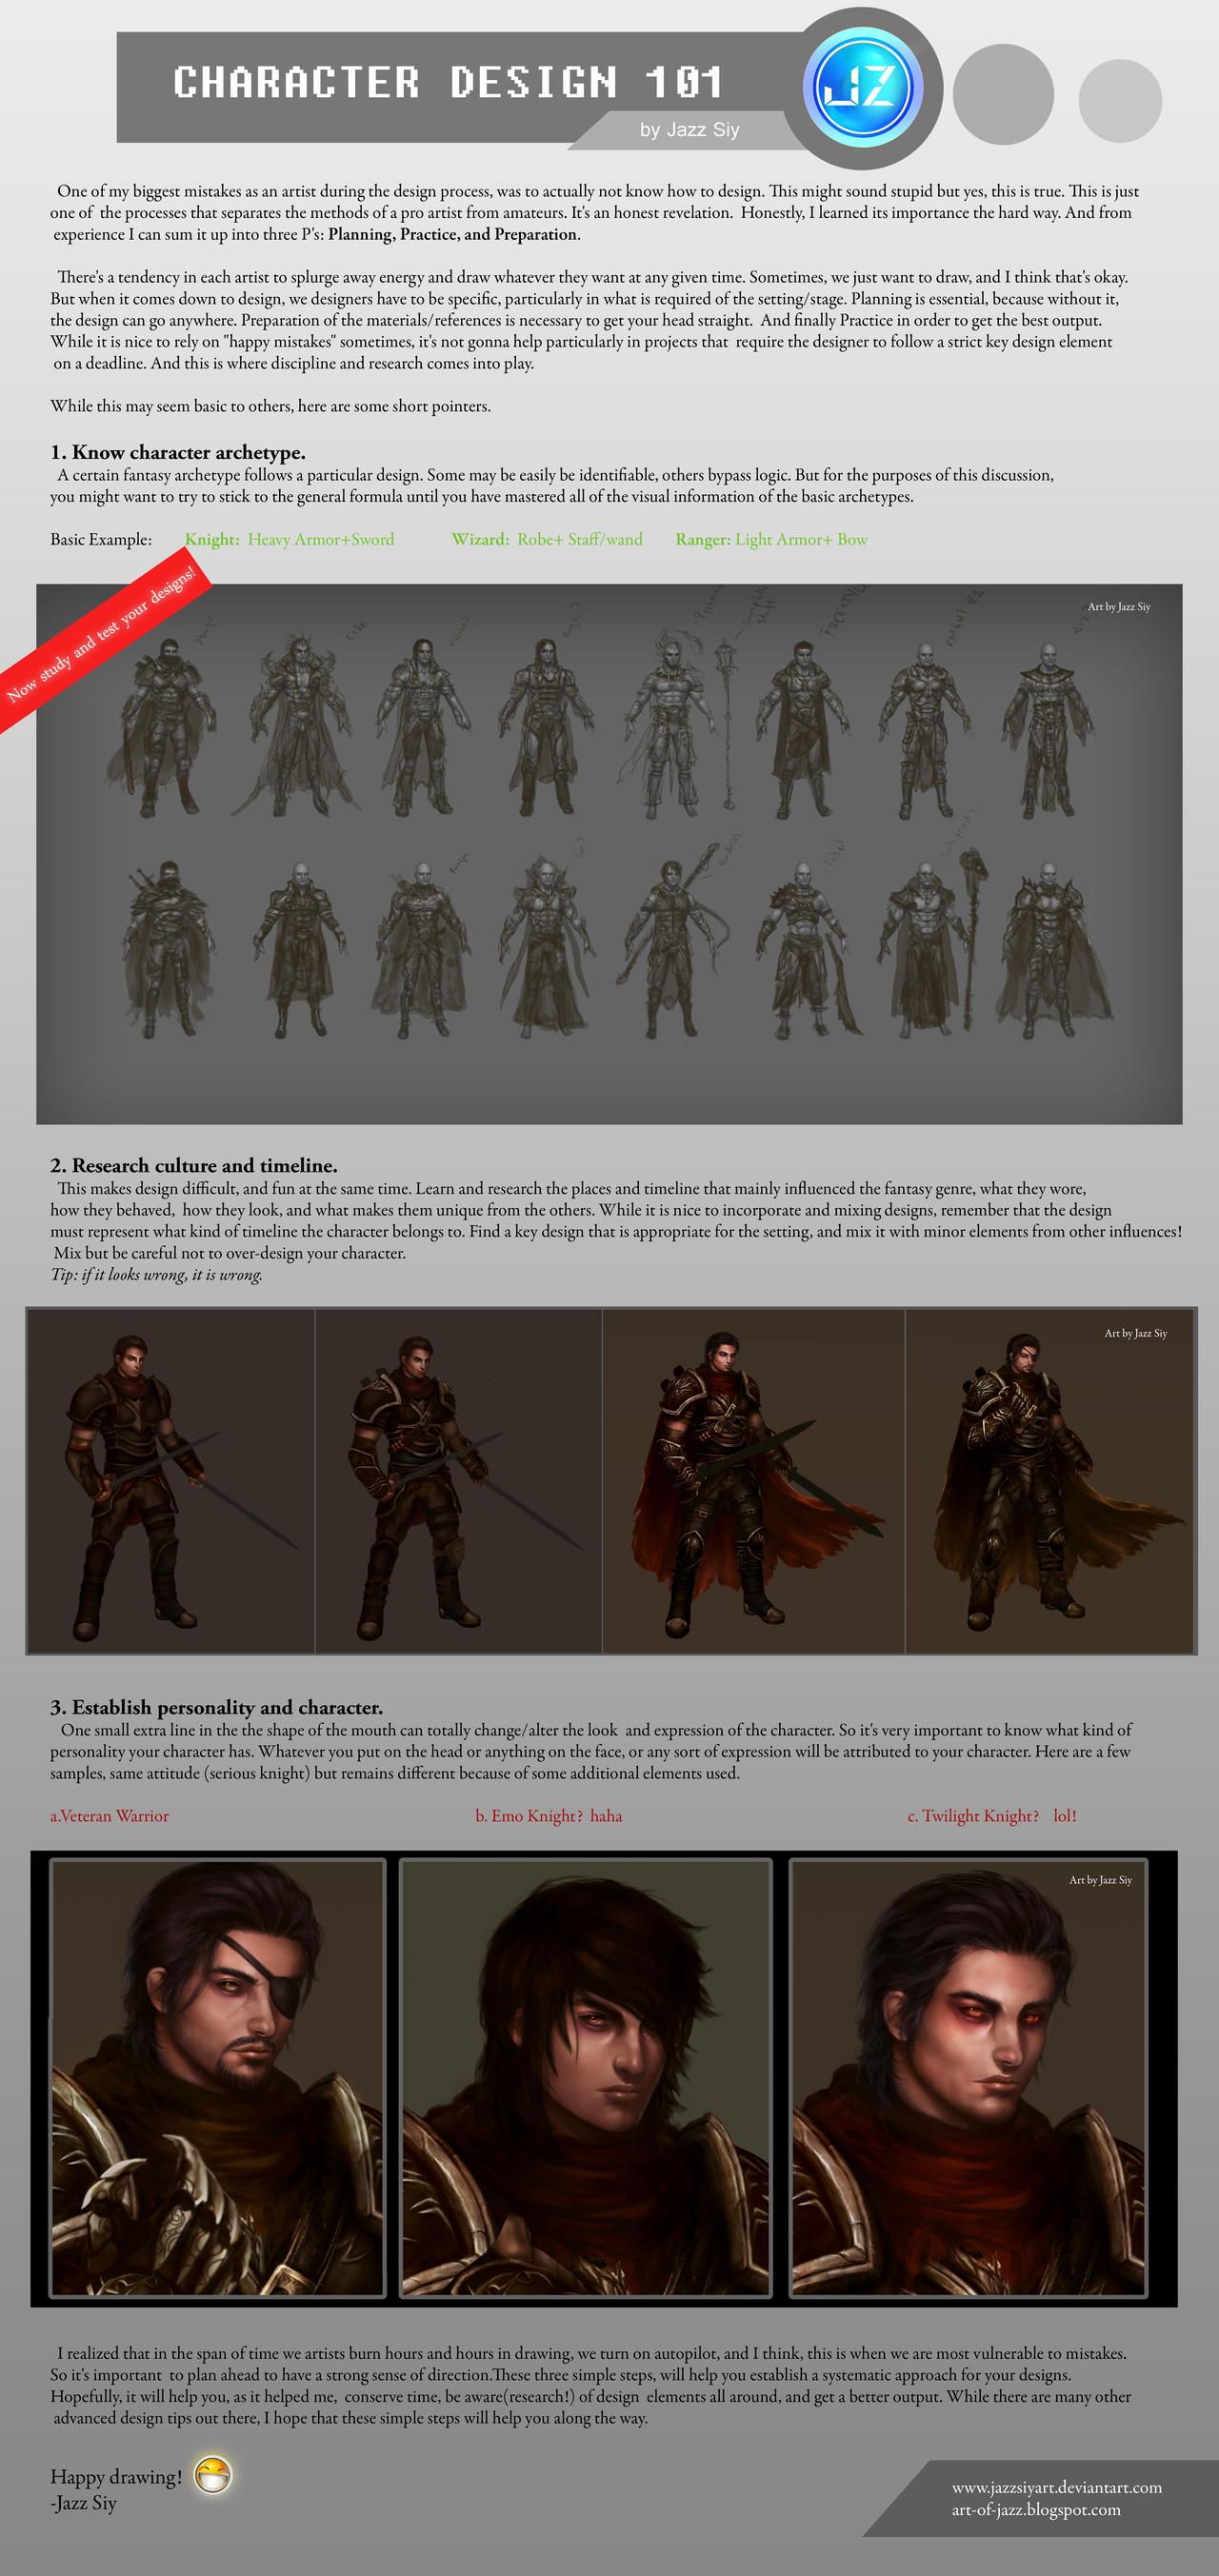 Character design 101 by JazzSiyArt